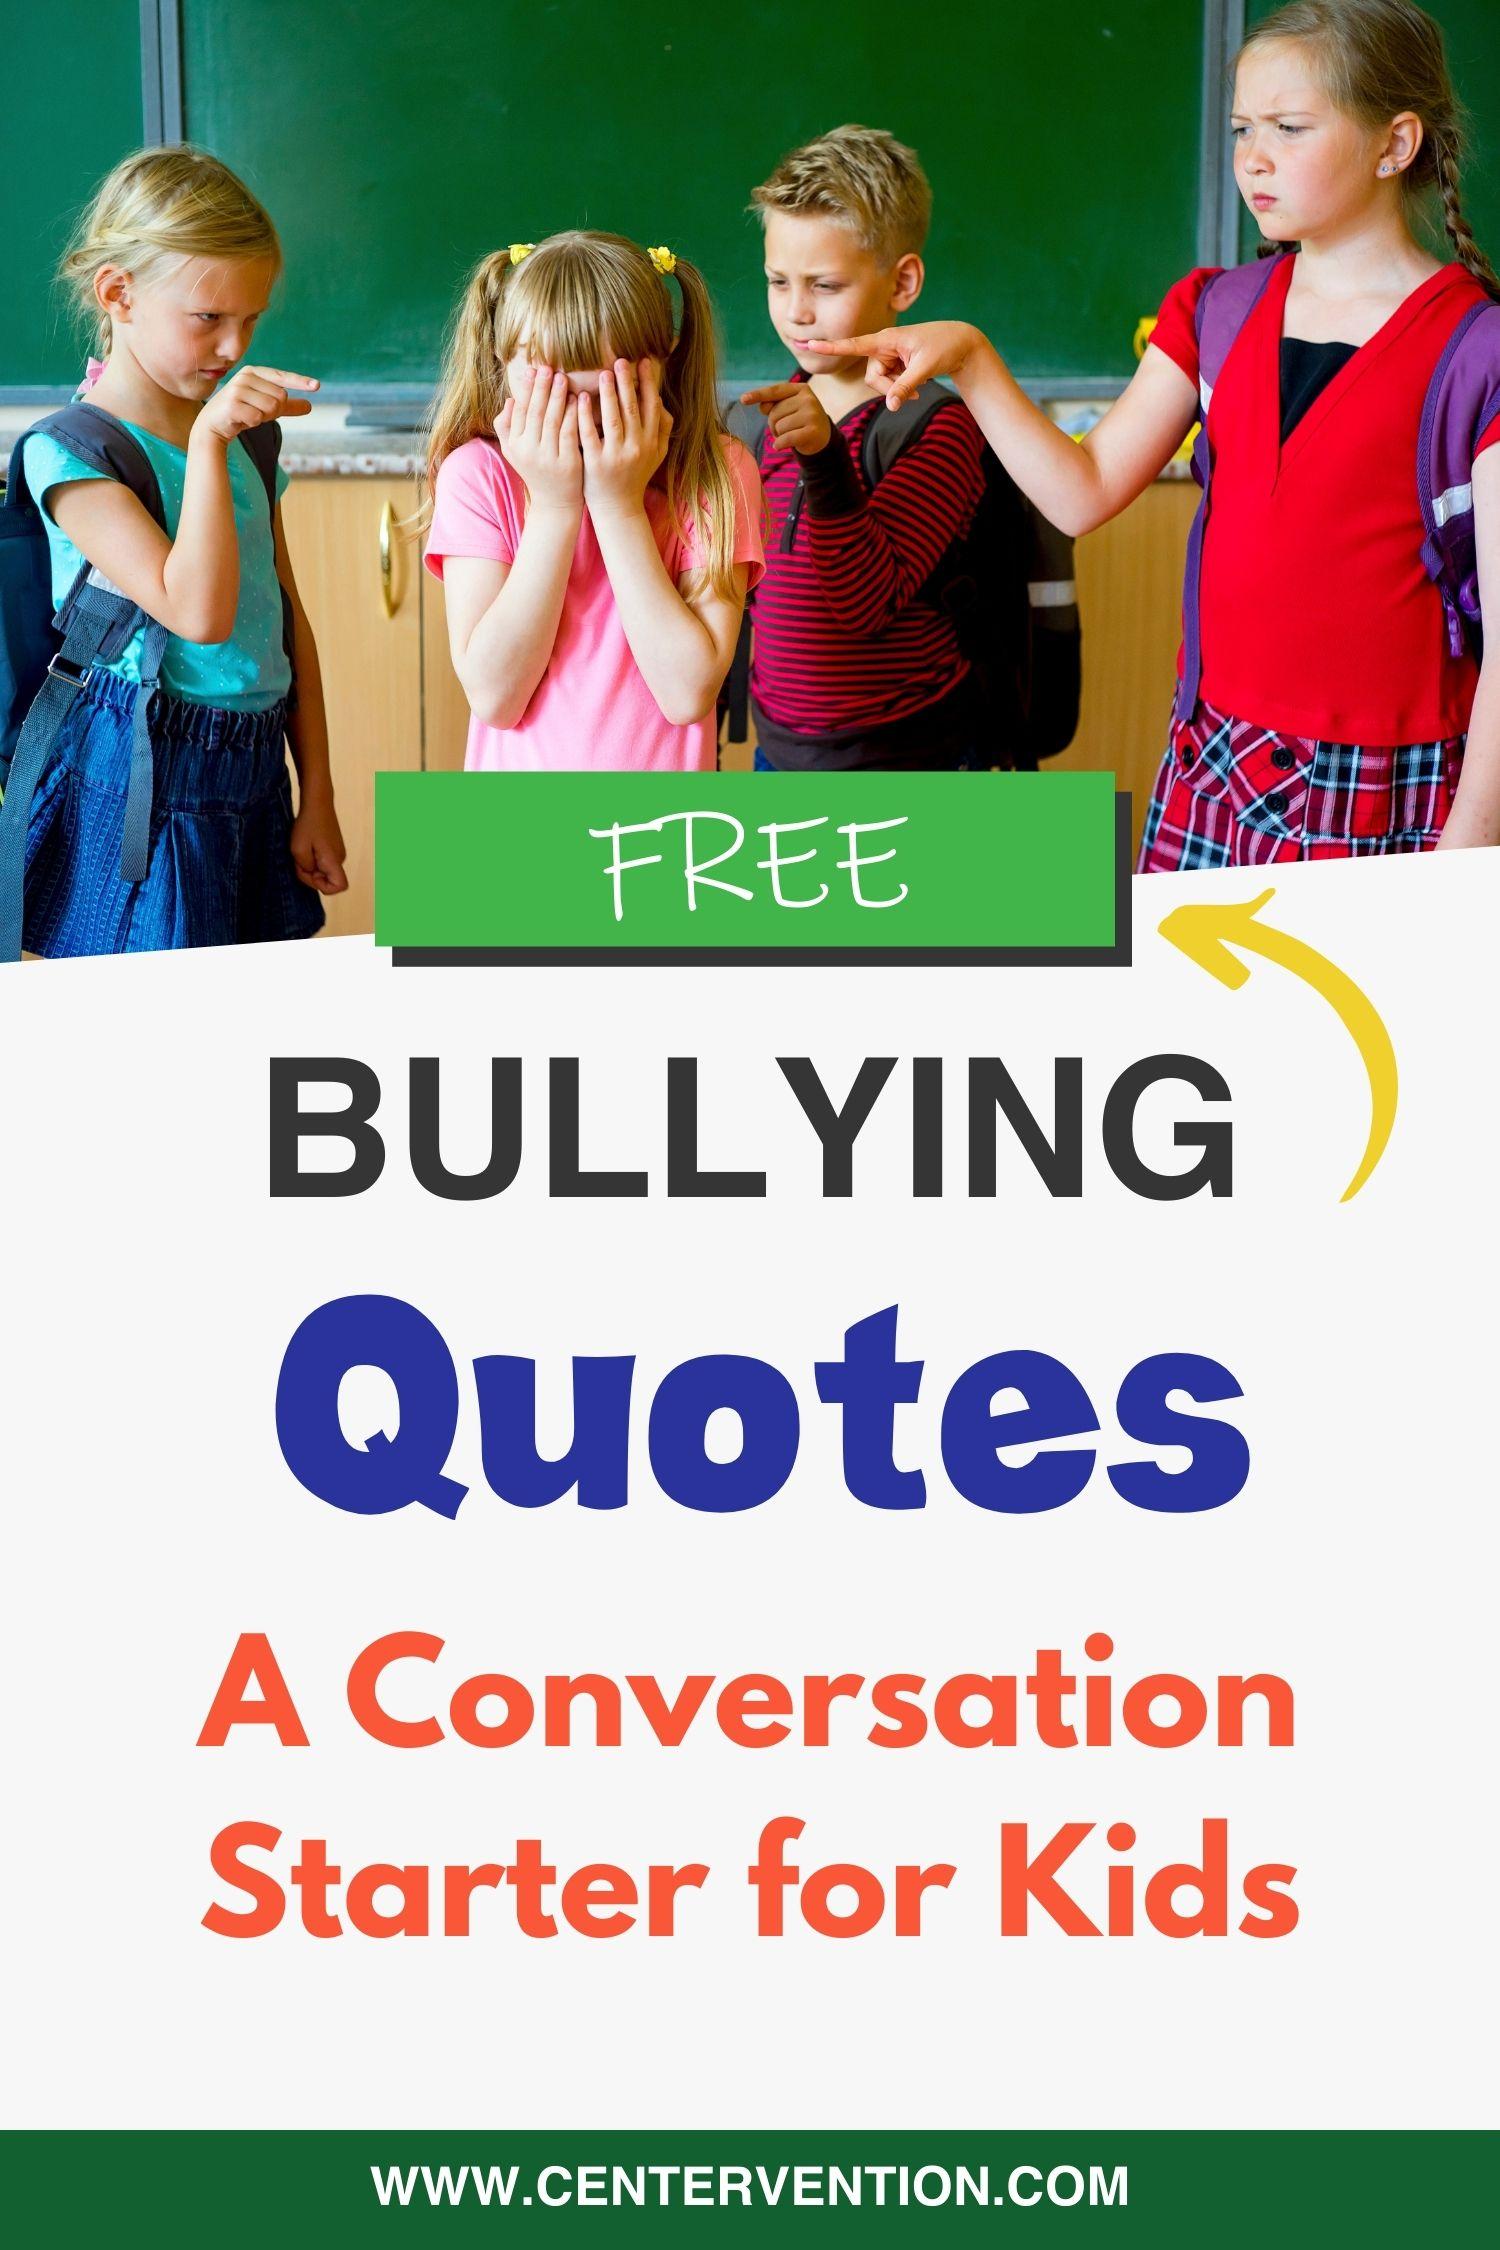 Free Bullying Quotes Pin